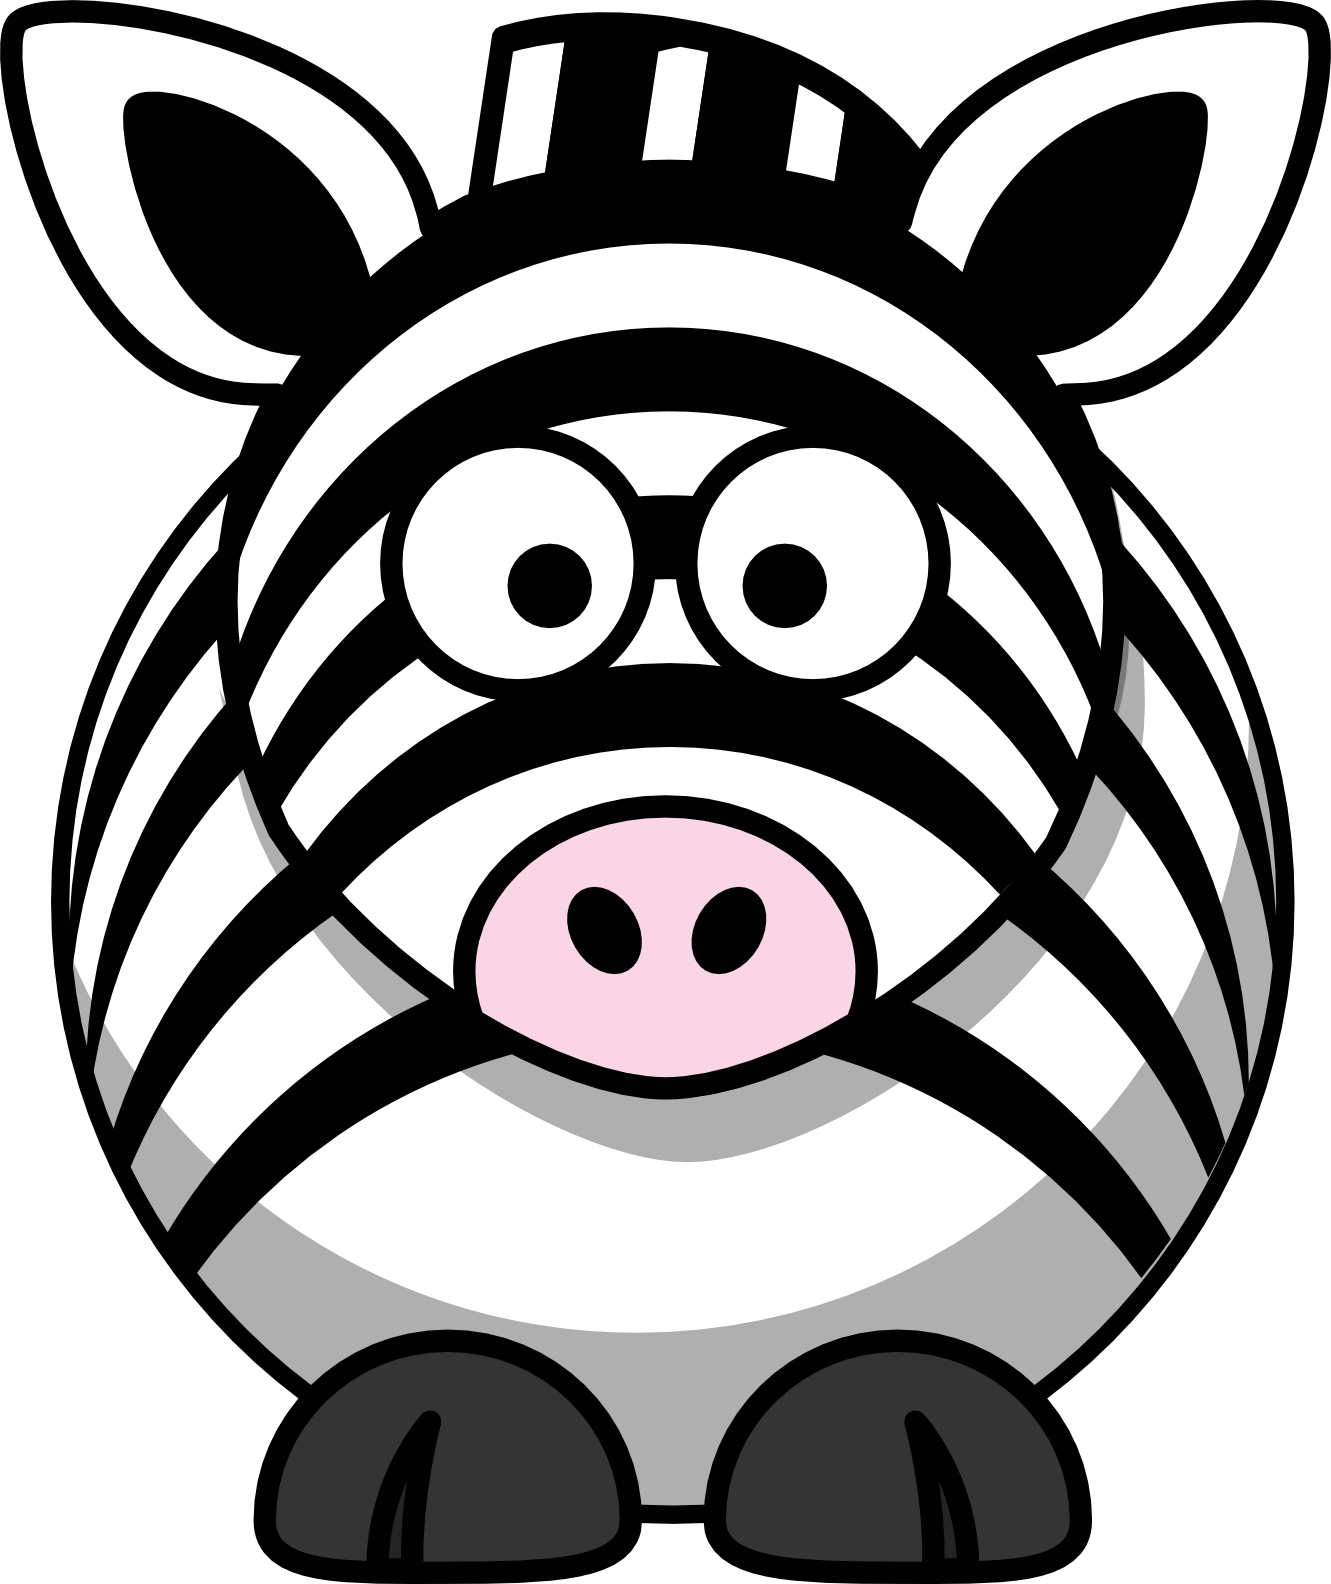 Clipart library background. Cartoon zebra scalable vector